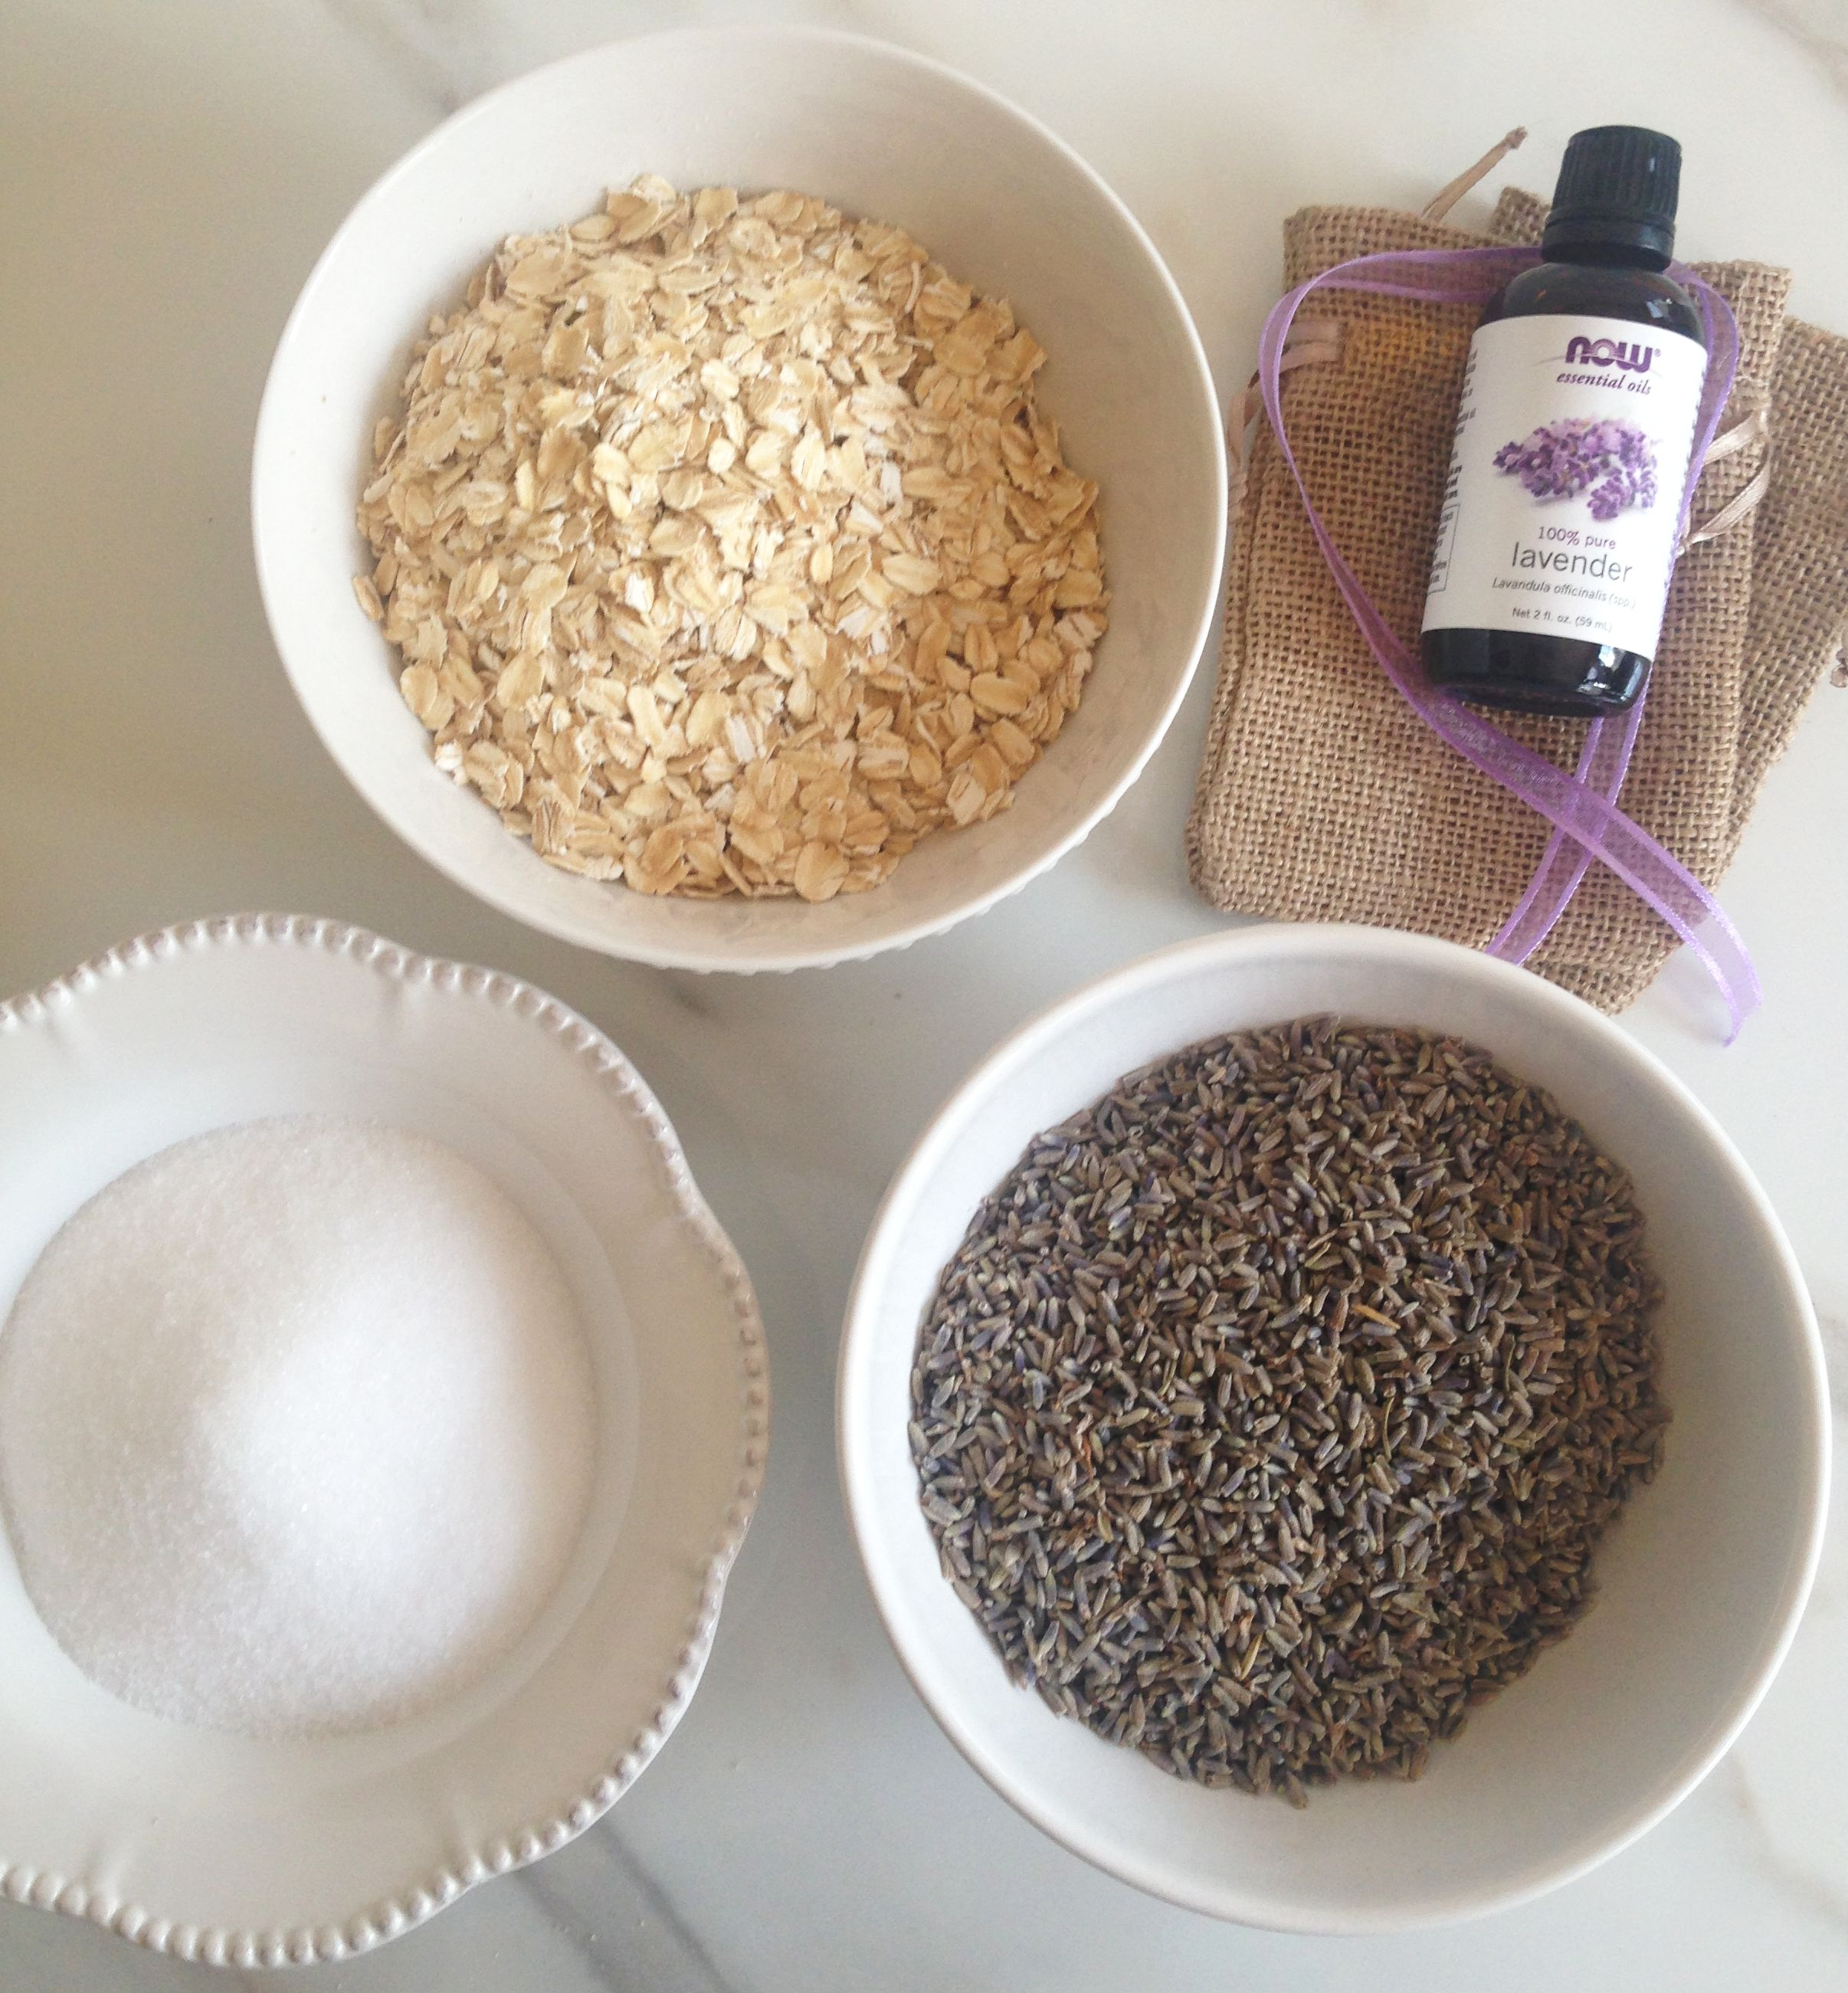 Lavender Sea Salt Scrub Diy: Homemade Lavender Salt Scrub